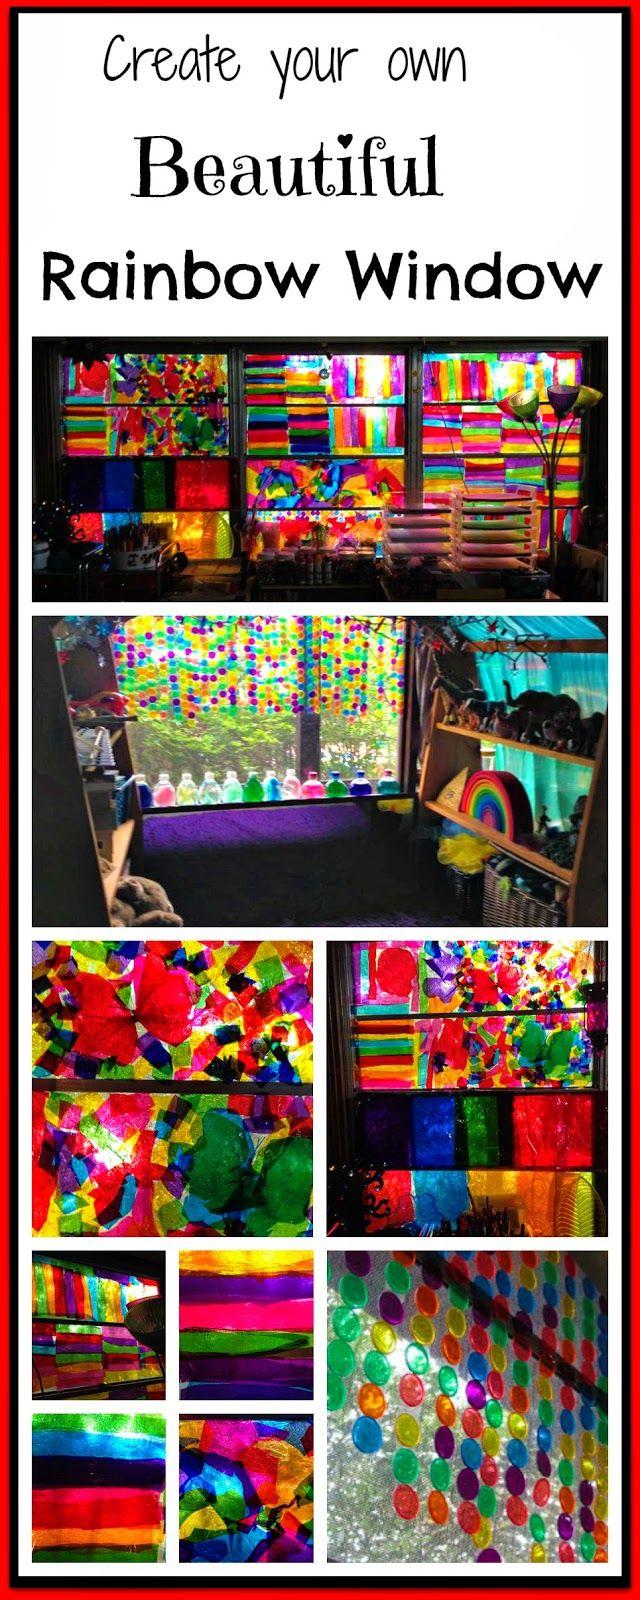 CAUTION! Twins at play!: Create a Beautiful Rainbow Window